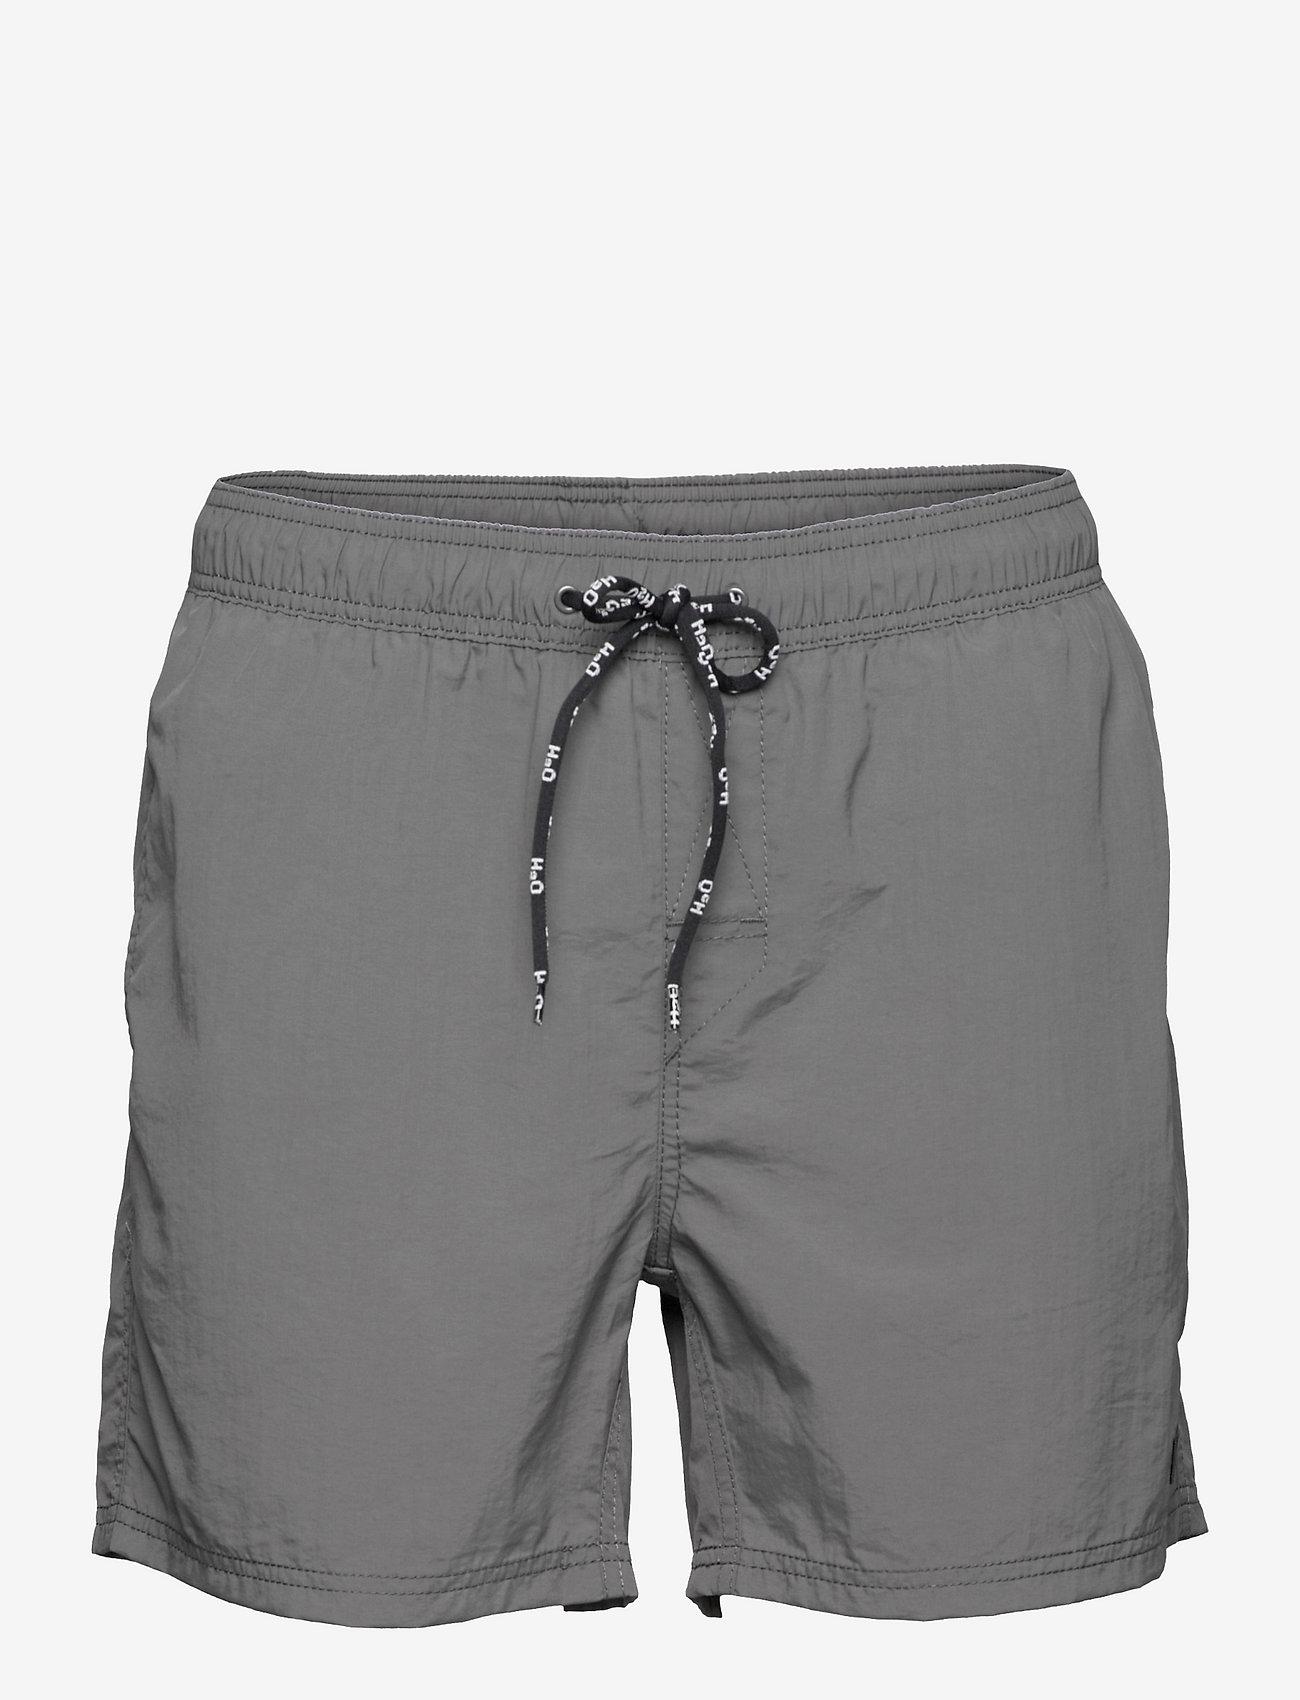 H2O - Leisure Swim Shorts - uimashortsit - dark grey - 0